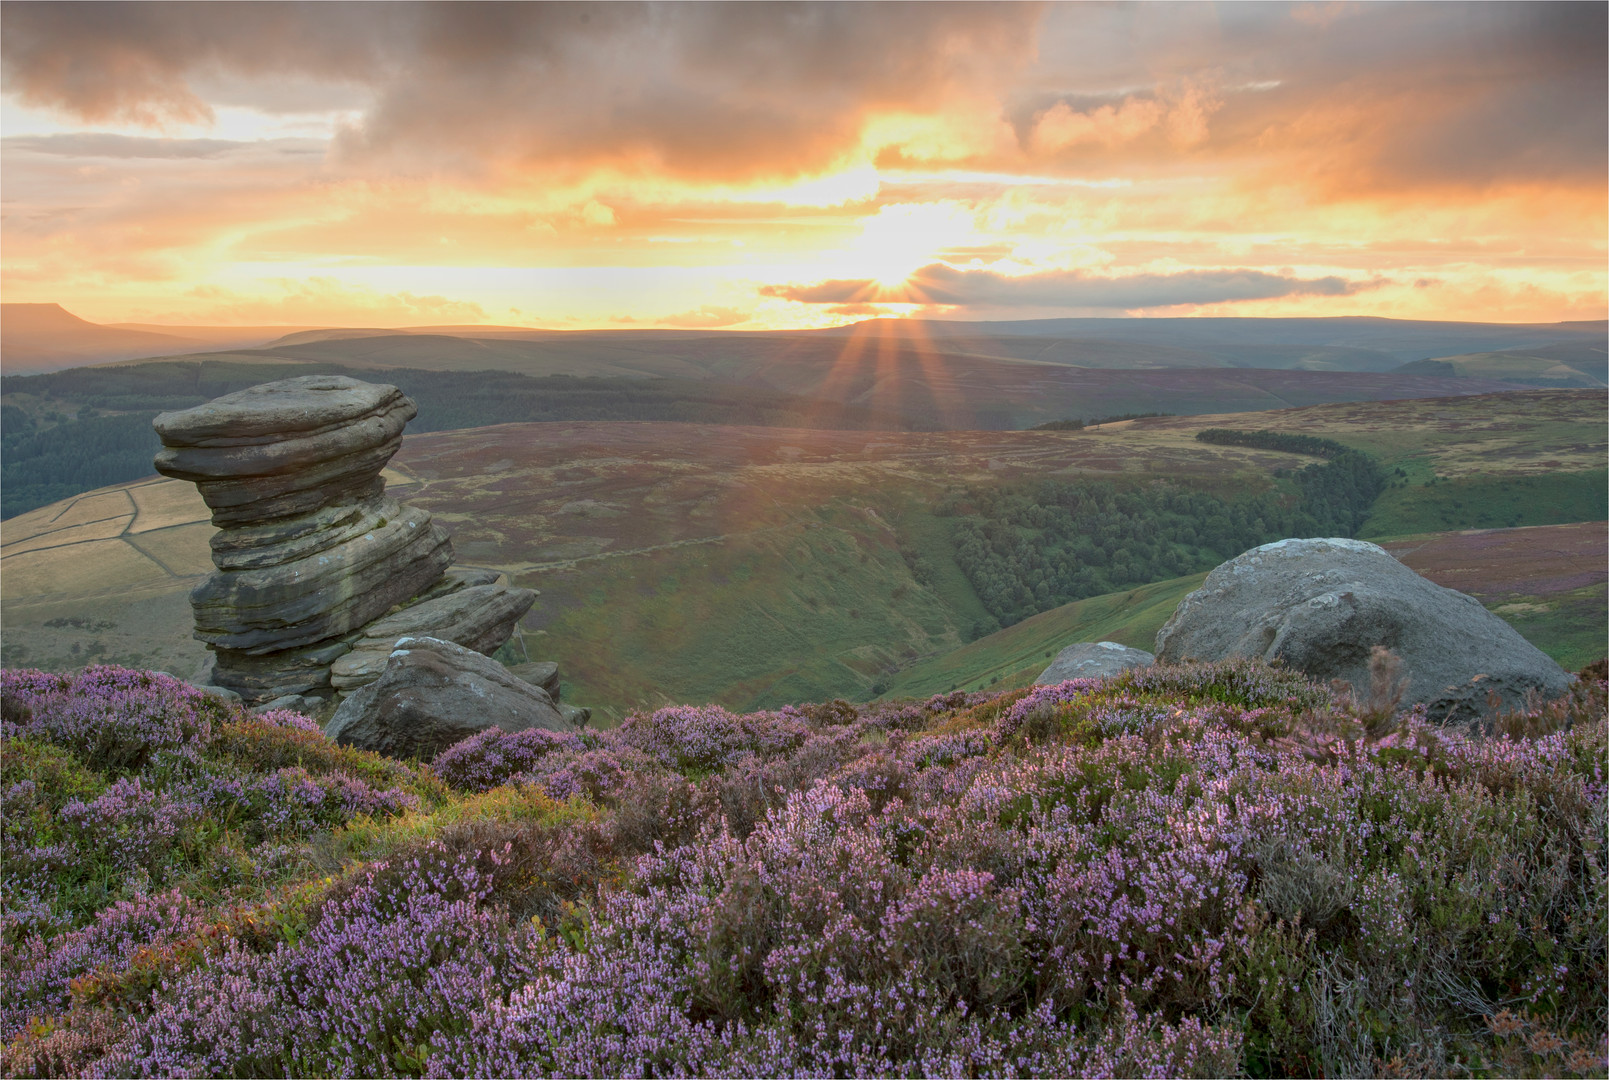 Sunset from the Derwent Edge